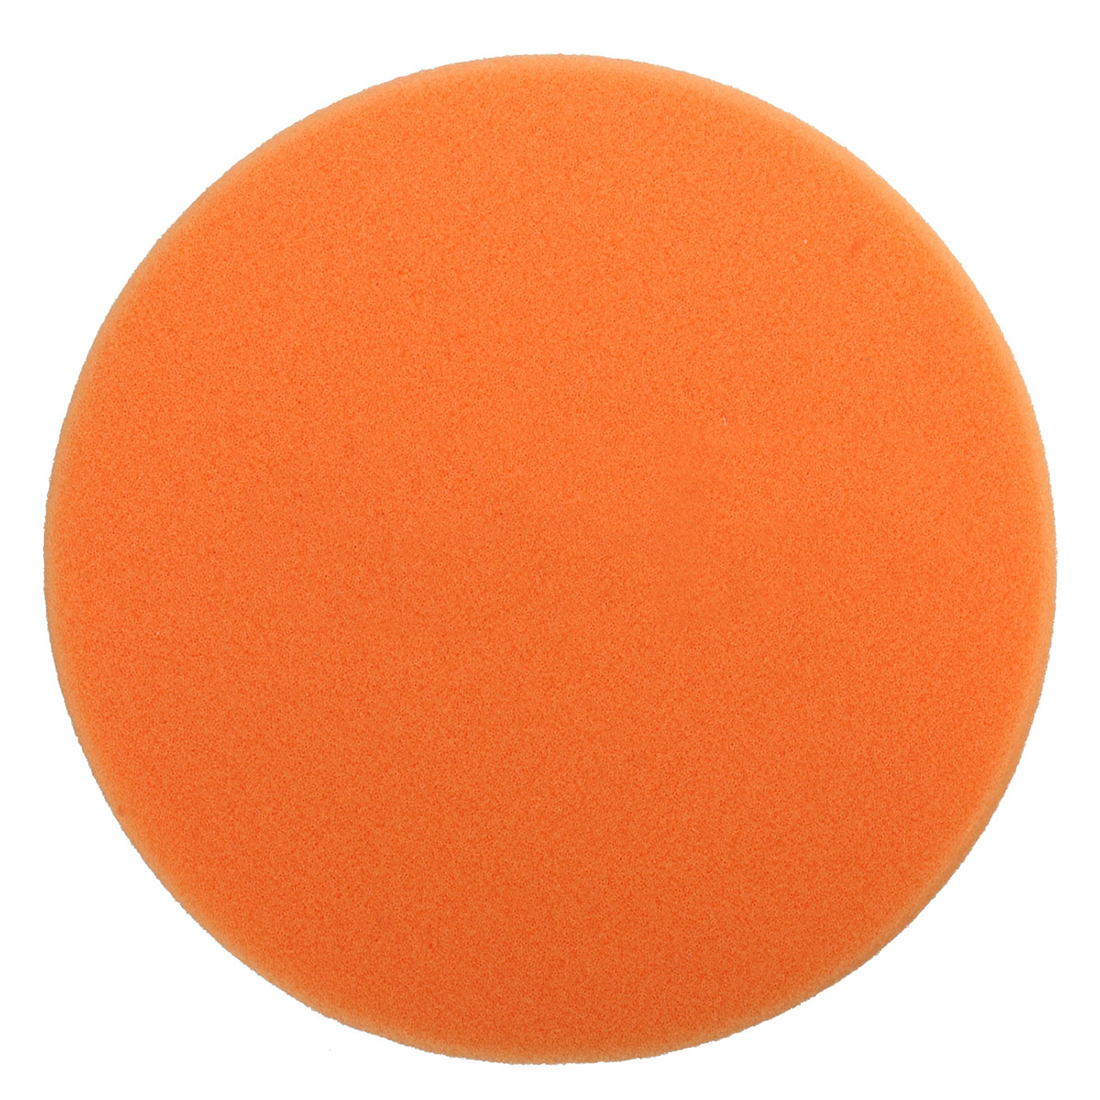 6 Inch 150mm Soft Flat Sponge Buffer Polishing Pad Kit For Auto Car Polisher Color:Orange